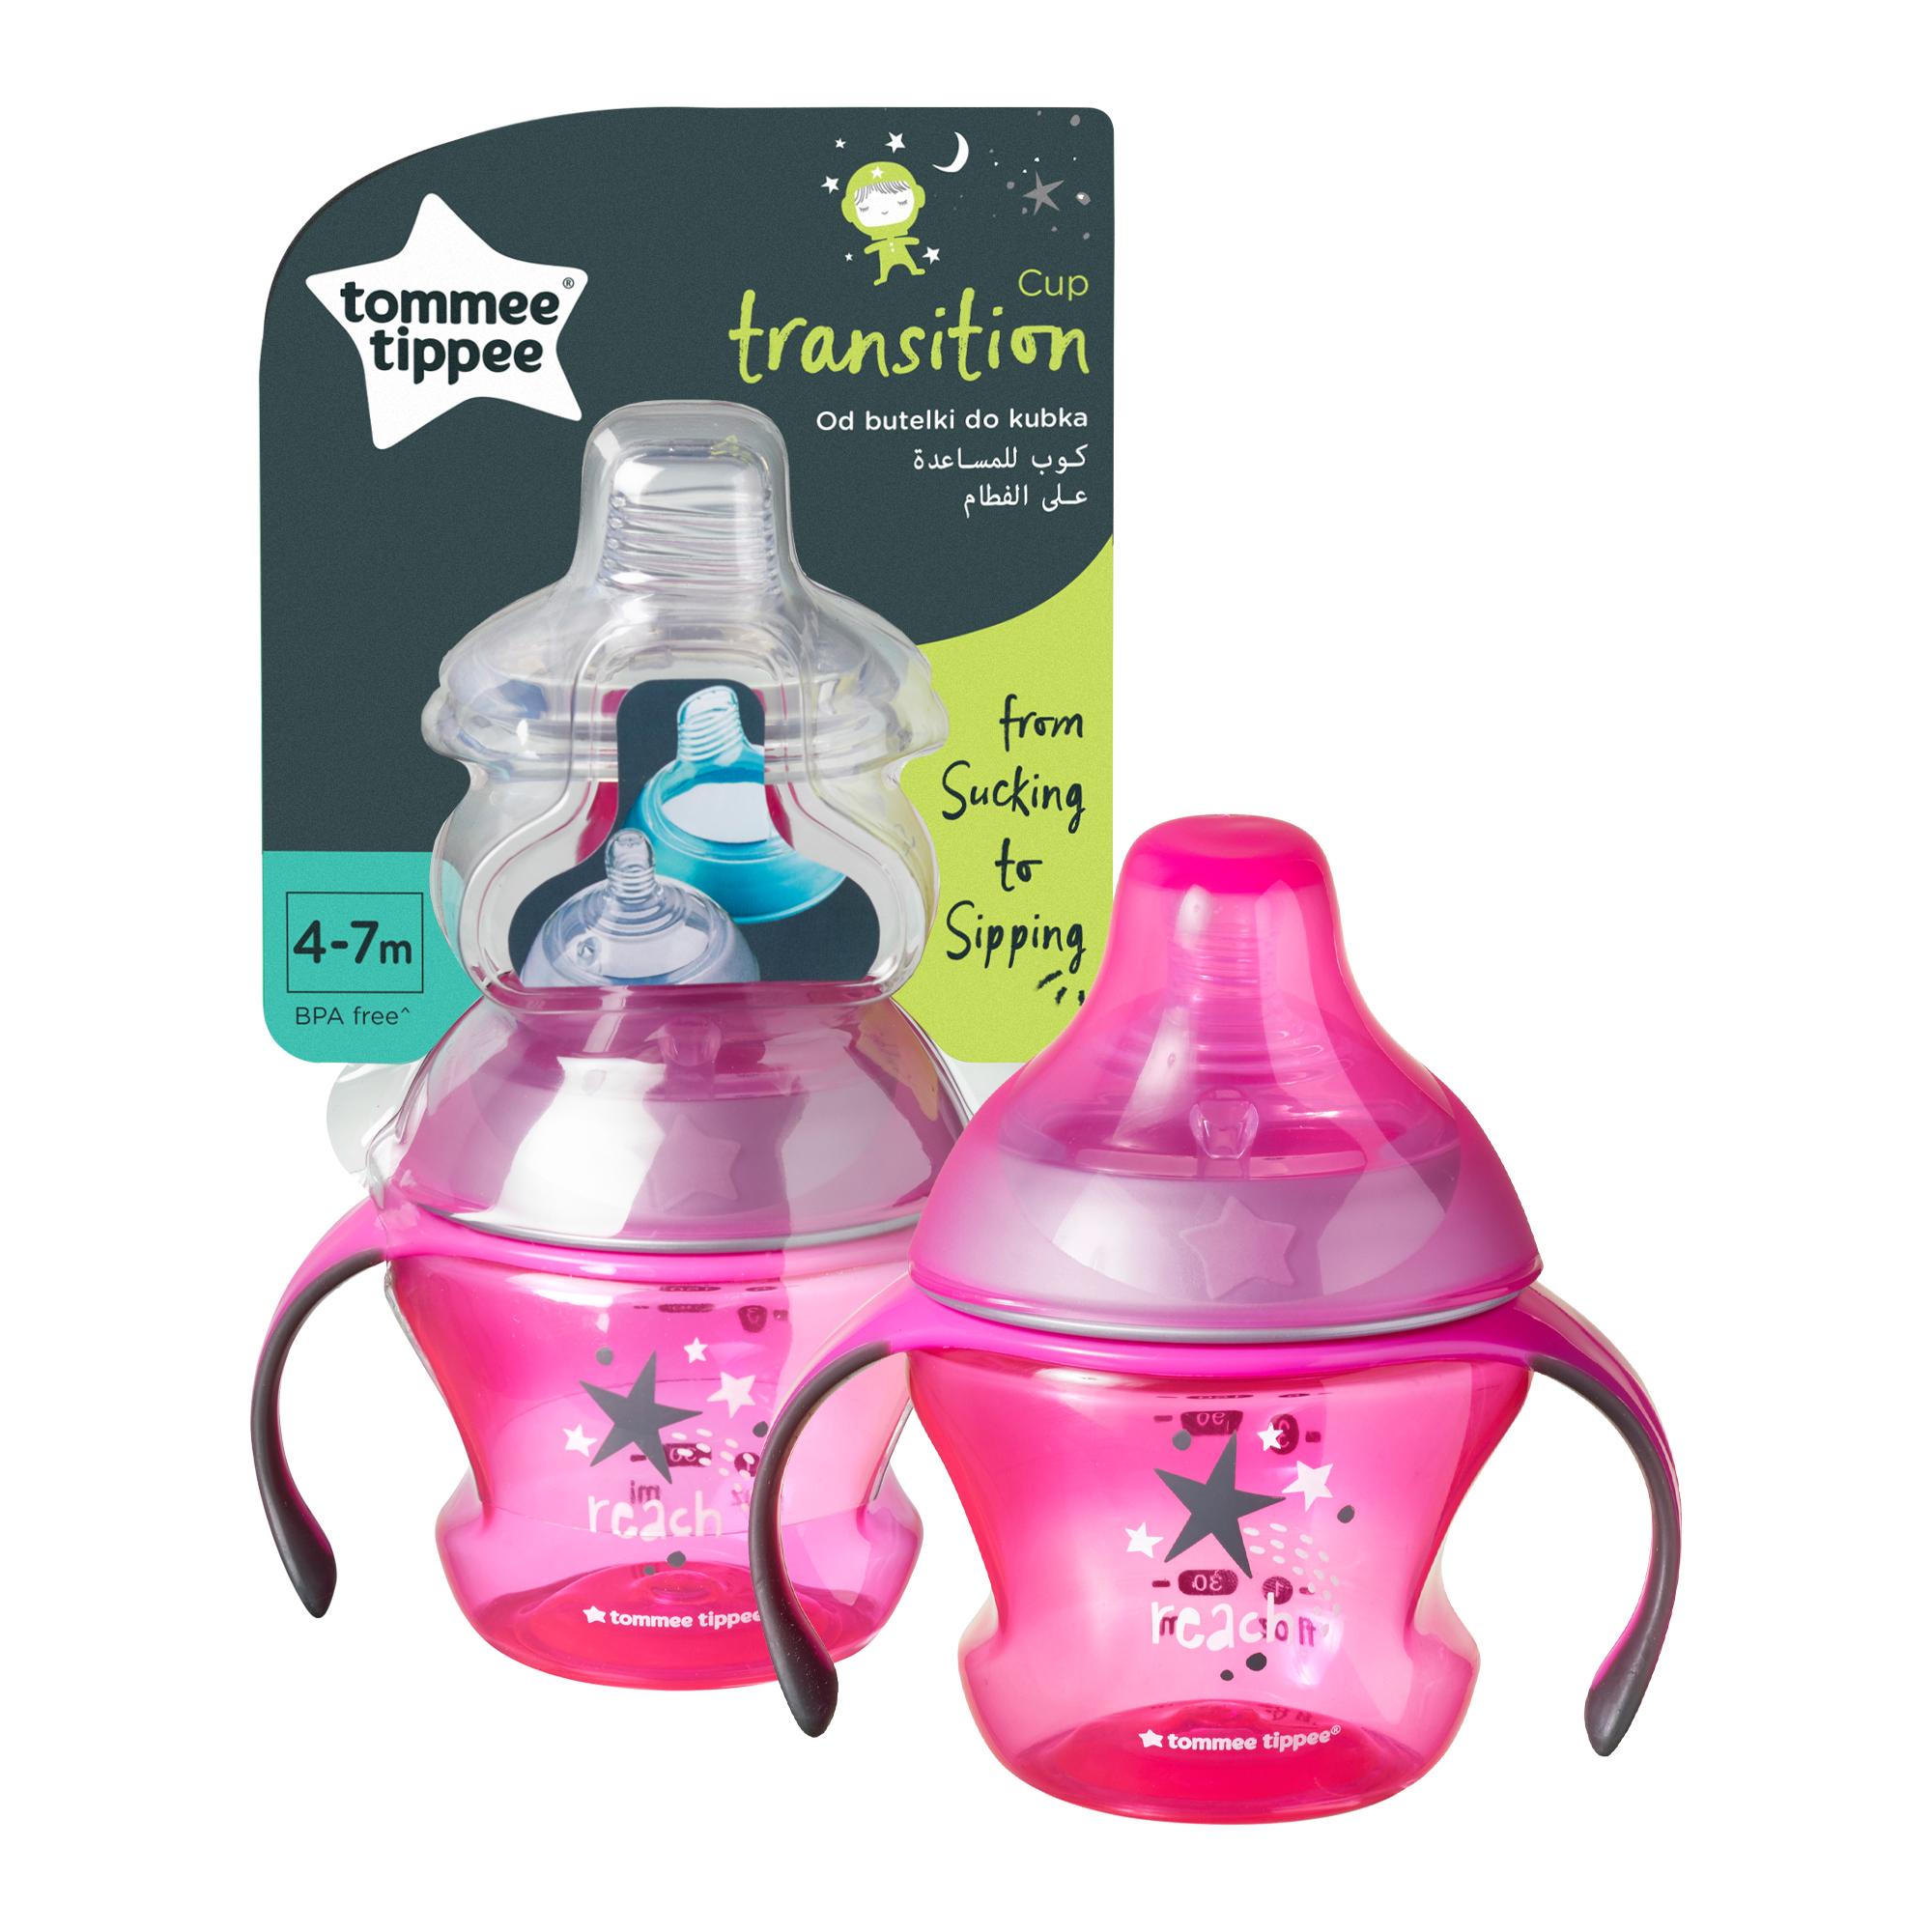 Cana de tranzitie Tommee Tippee, 150 ml, 4-7 luni, Roz, 1 buc